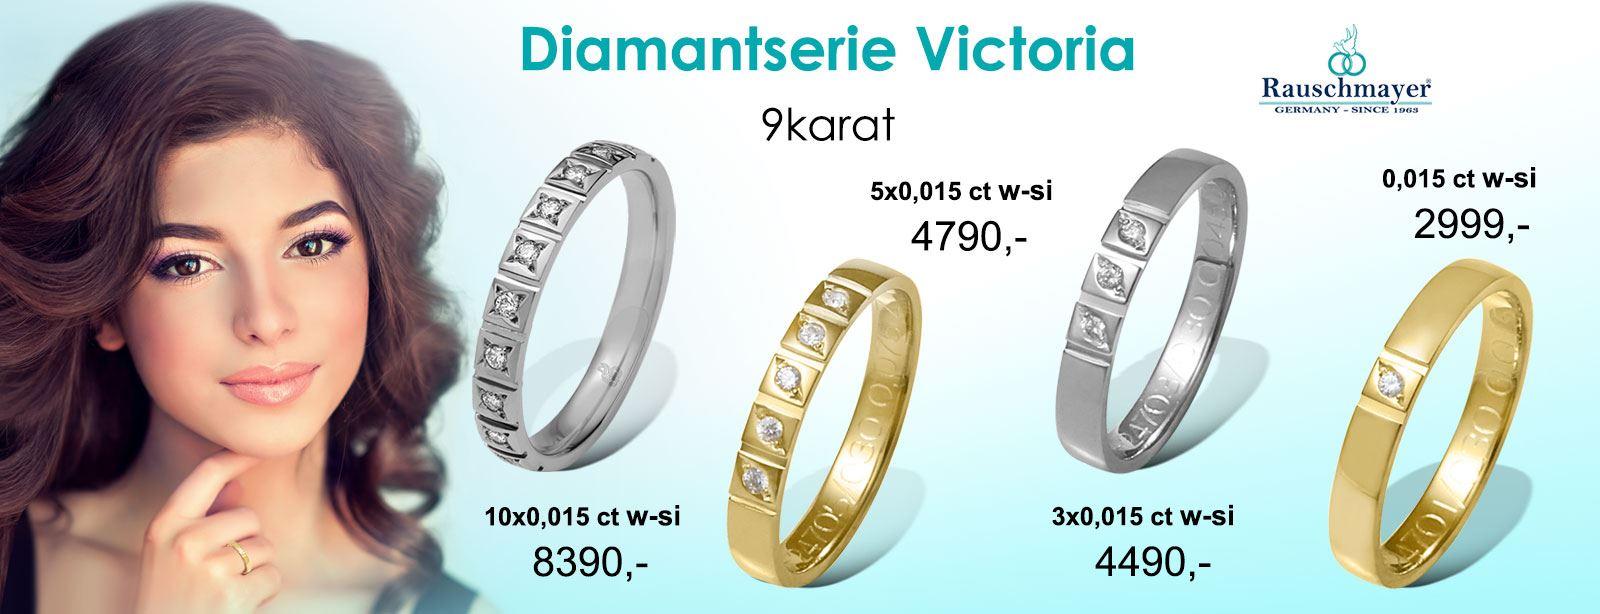 Diamantserie Victoria